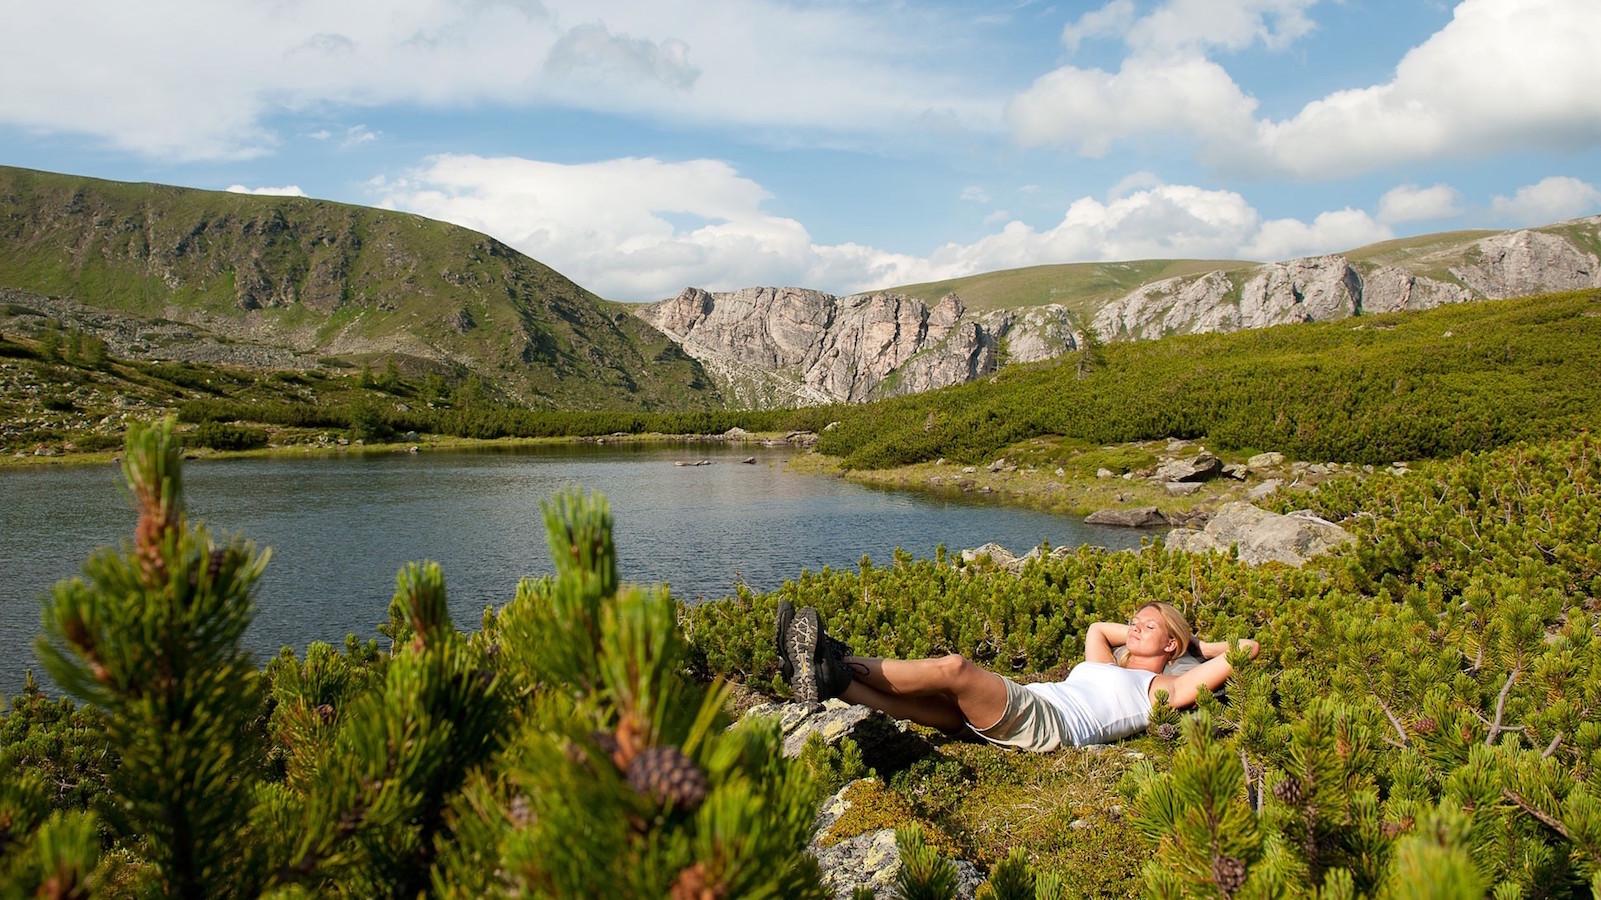 Nockberge Biosphere Reserve Karnten Carinthia